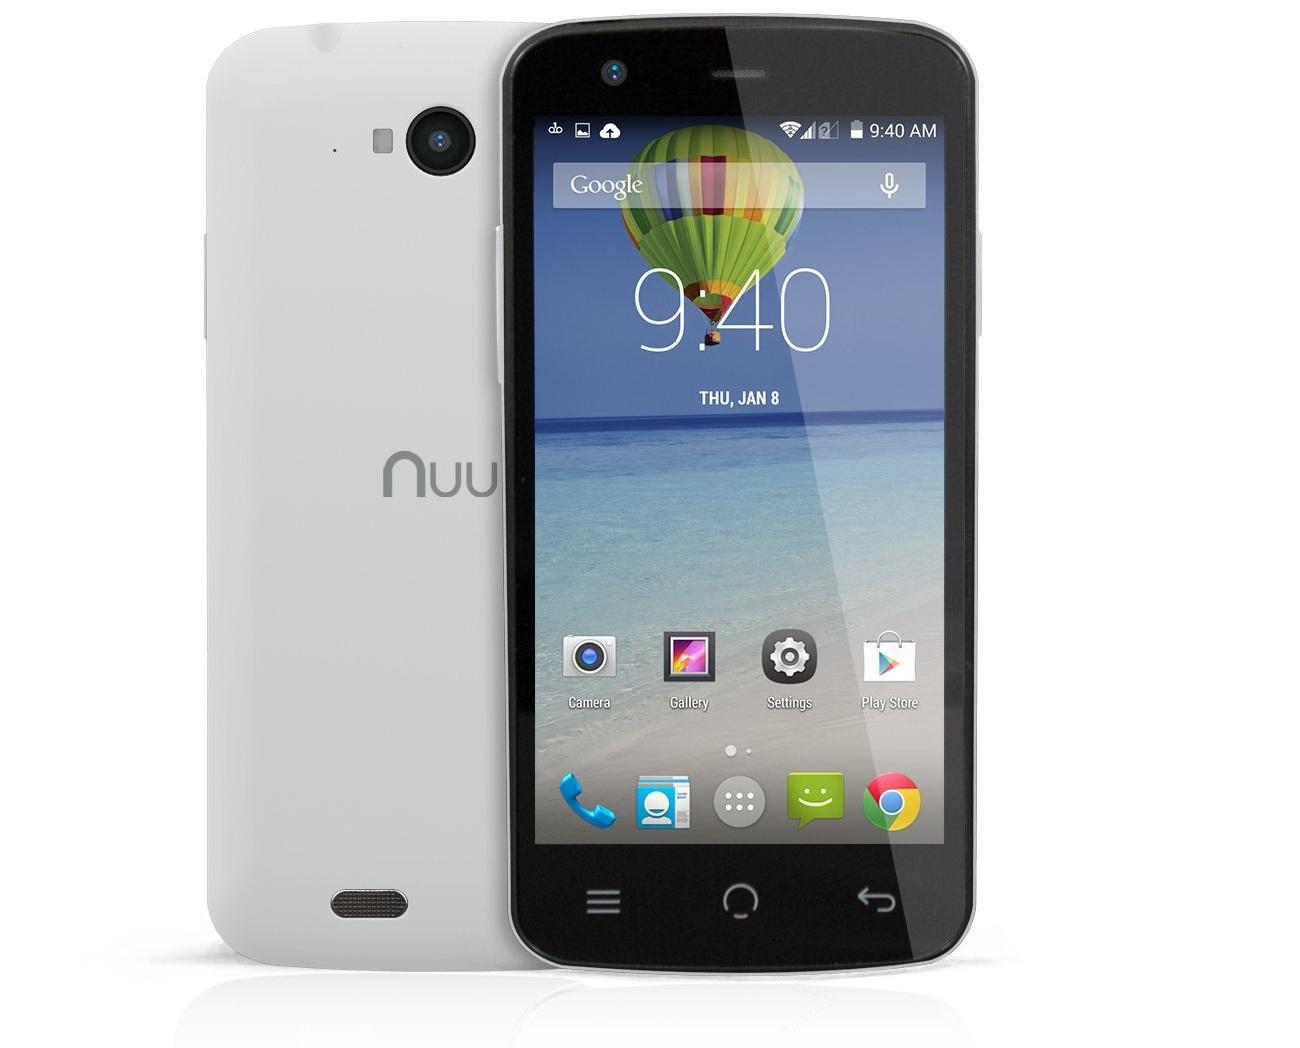 NUU X3 Phone